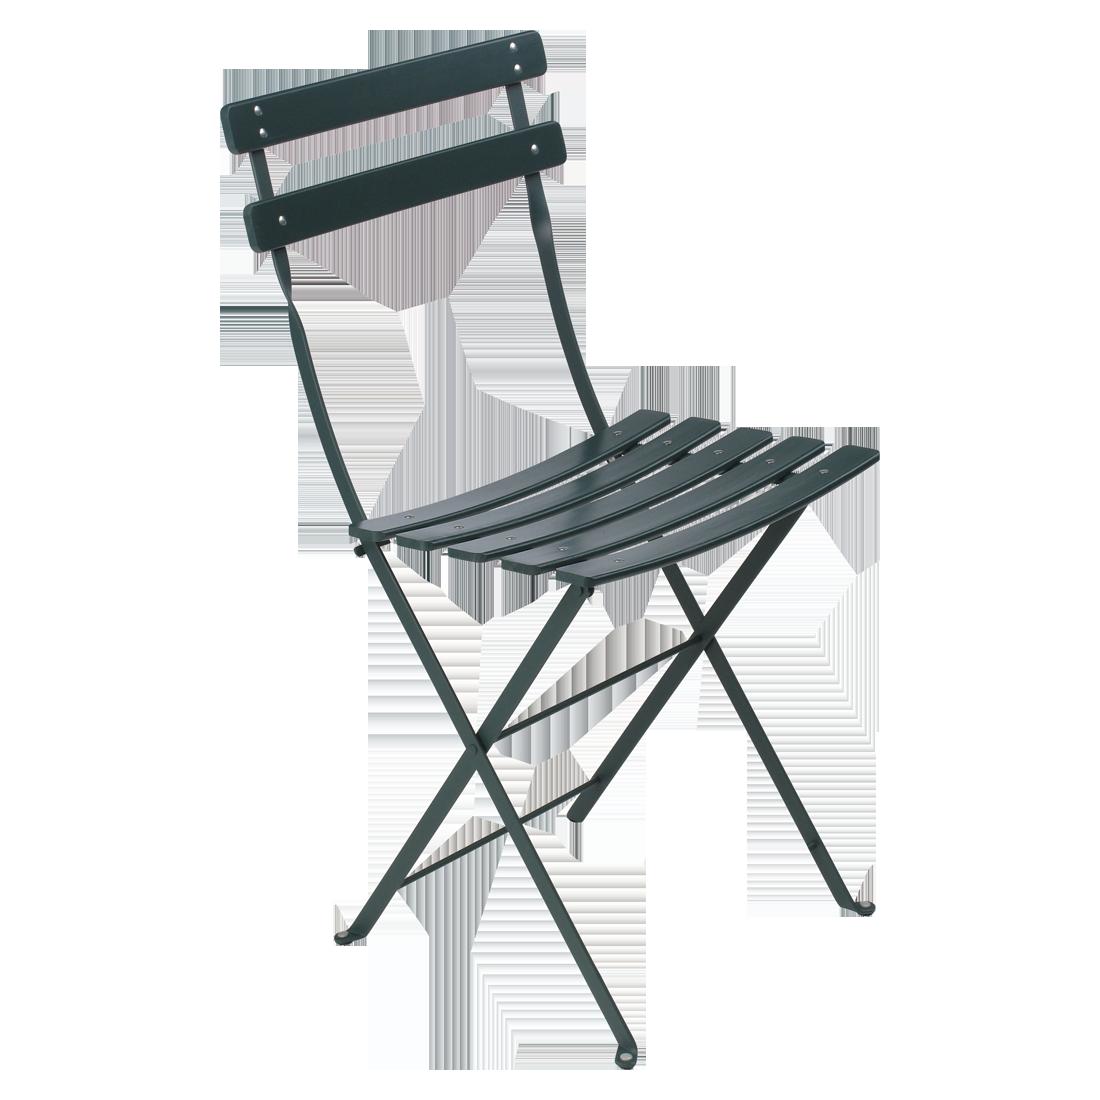 Chaise bistro classique de fermob 2 coloris for Chaise bistrot fermob